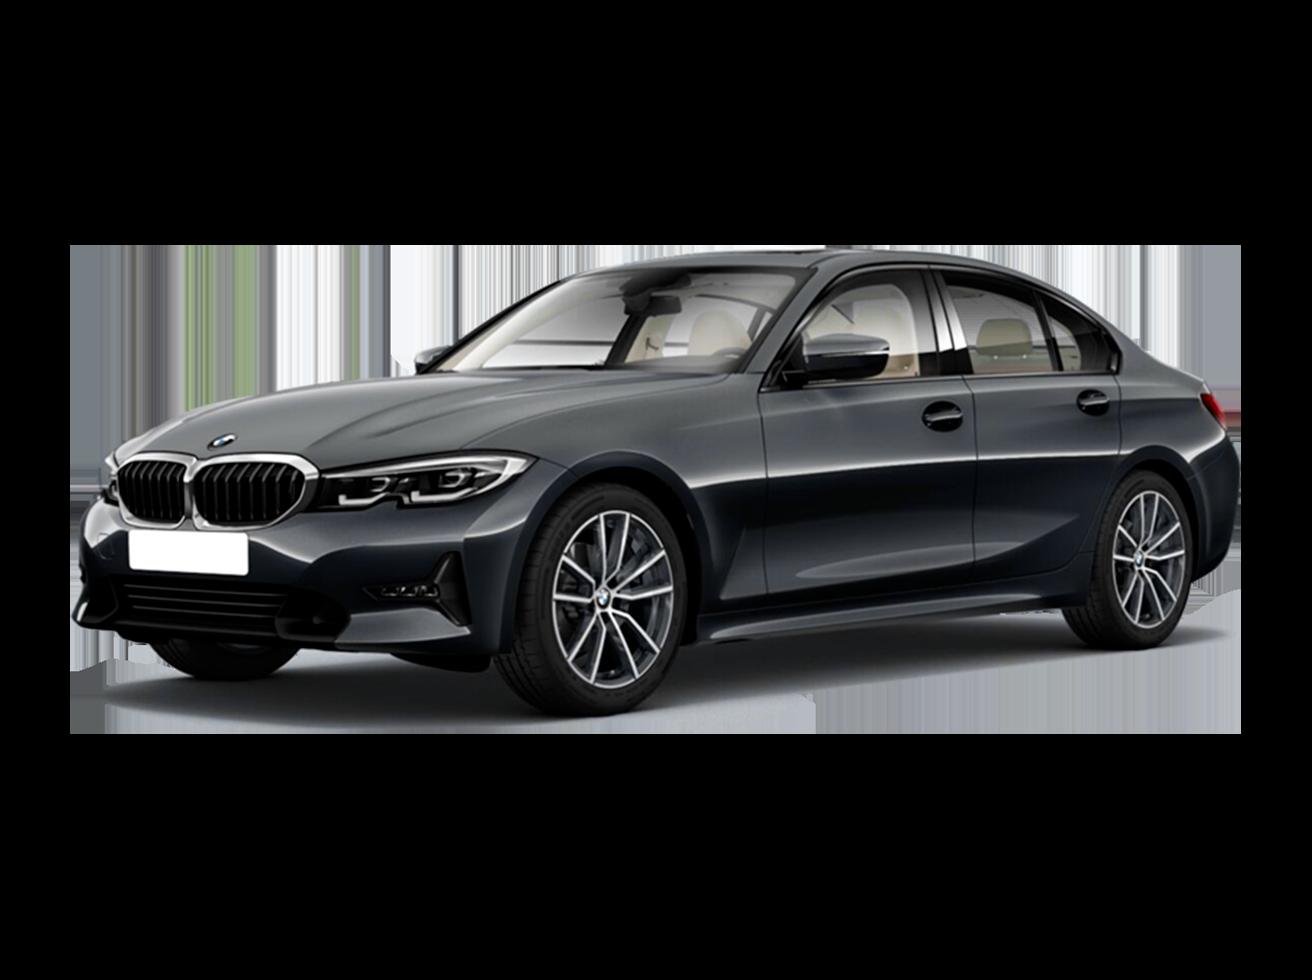 BMW - 320I - 2.0 16V TURBO FLEX SPORT GP AUTOMÁTICO